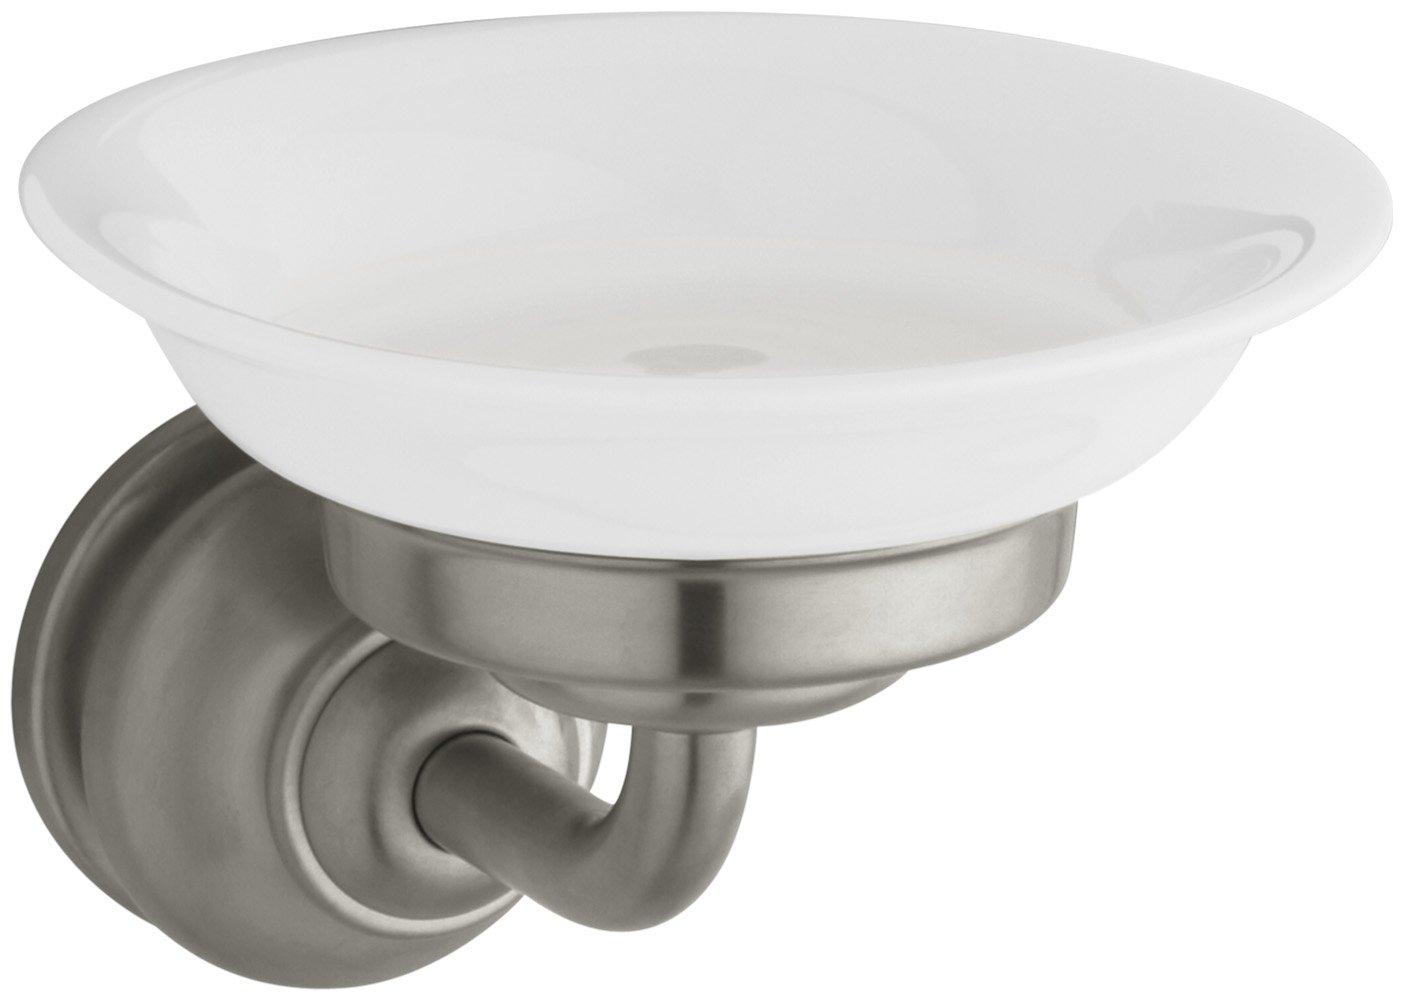 KOHLER K-12162-BN Fairfax Soap Dish, Vibrant Brushed Nickel